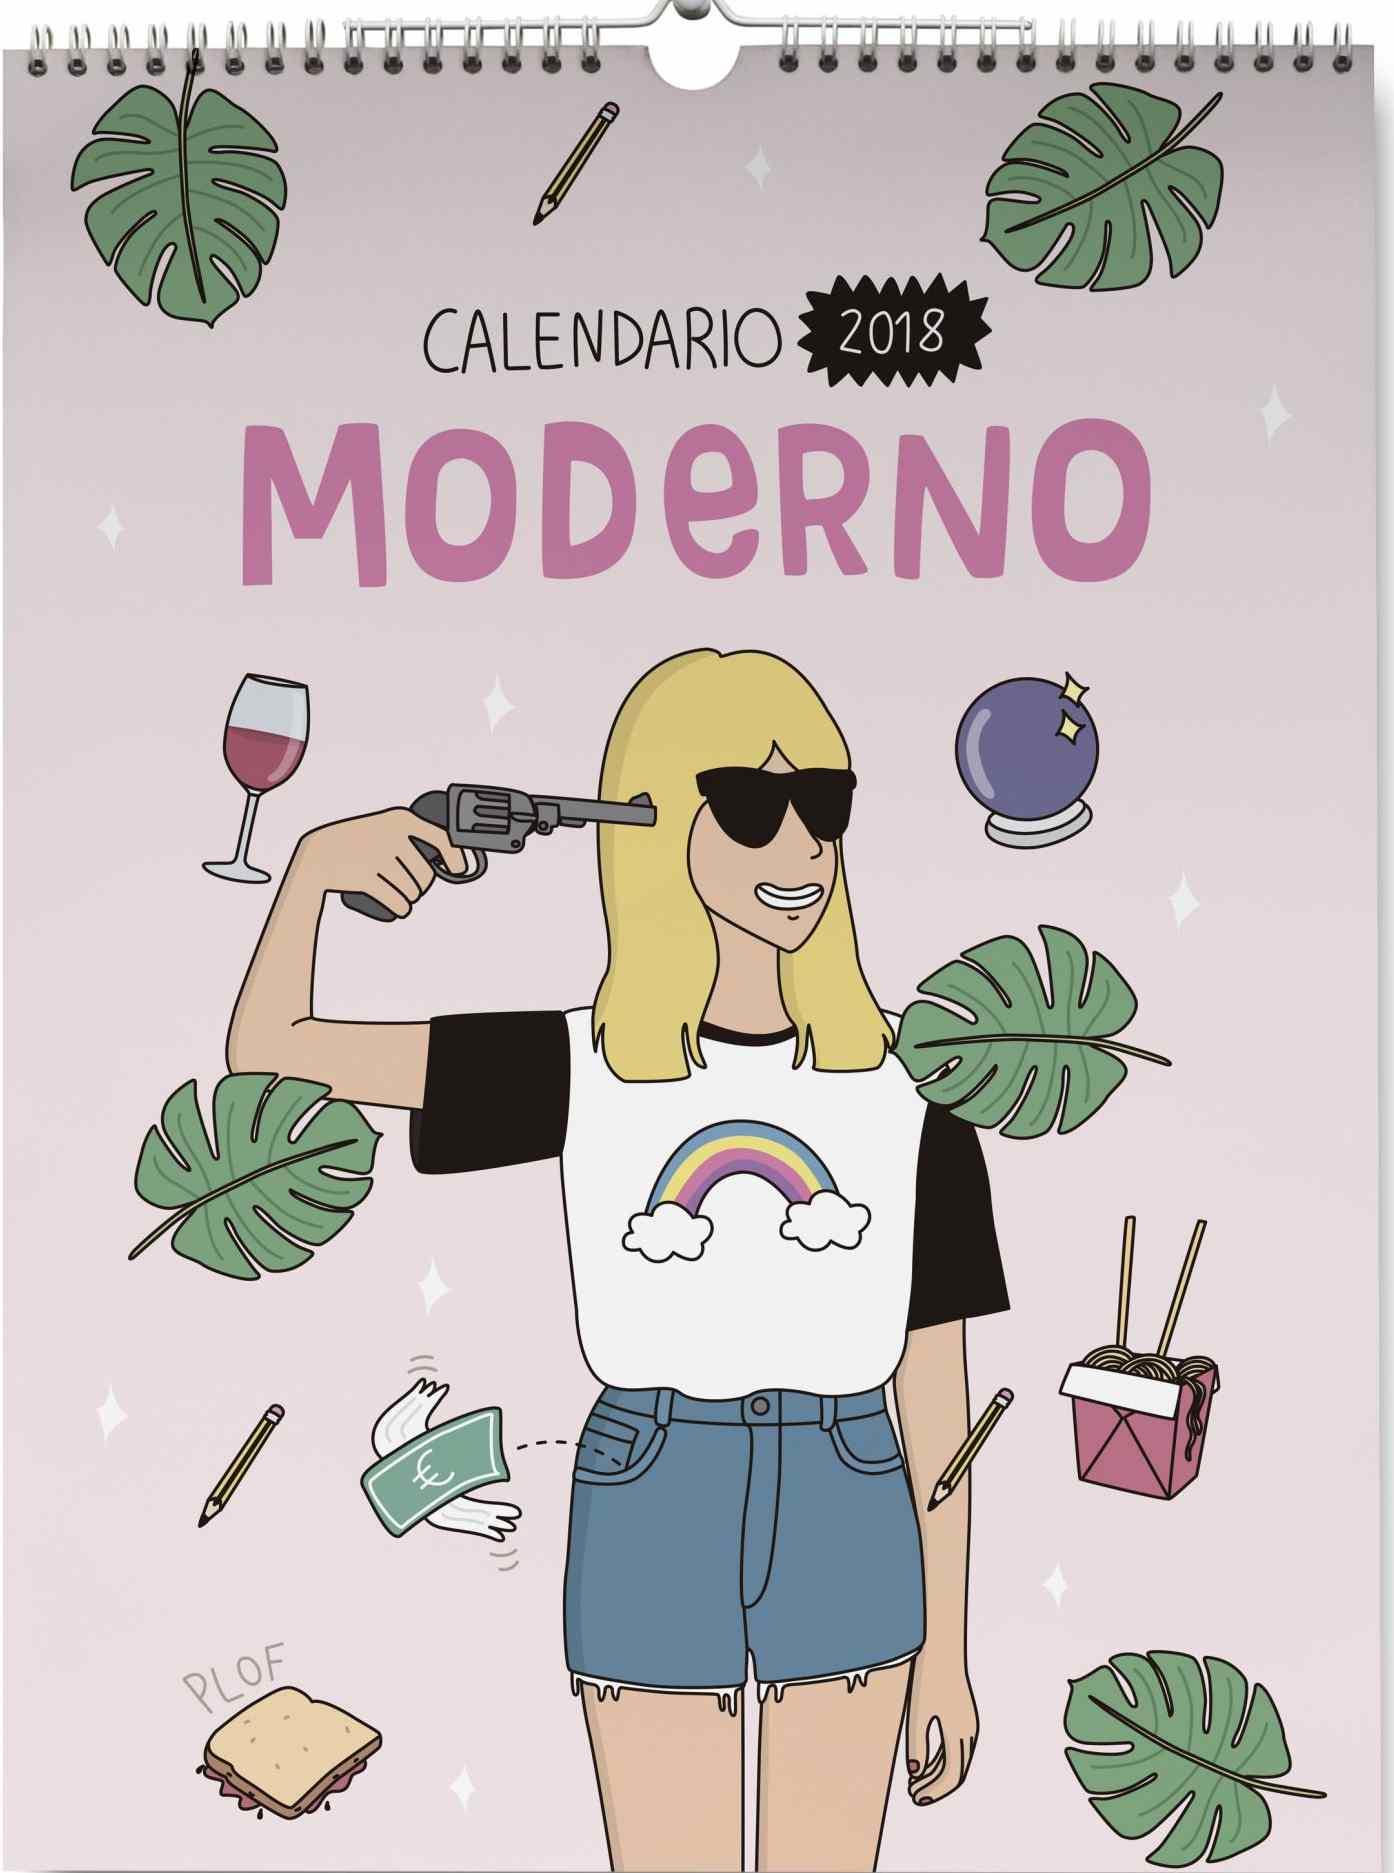 tan tan fan calendario pared 2018 moderna de pueblo-8432715094685